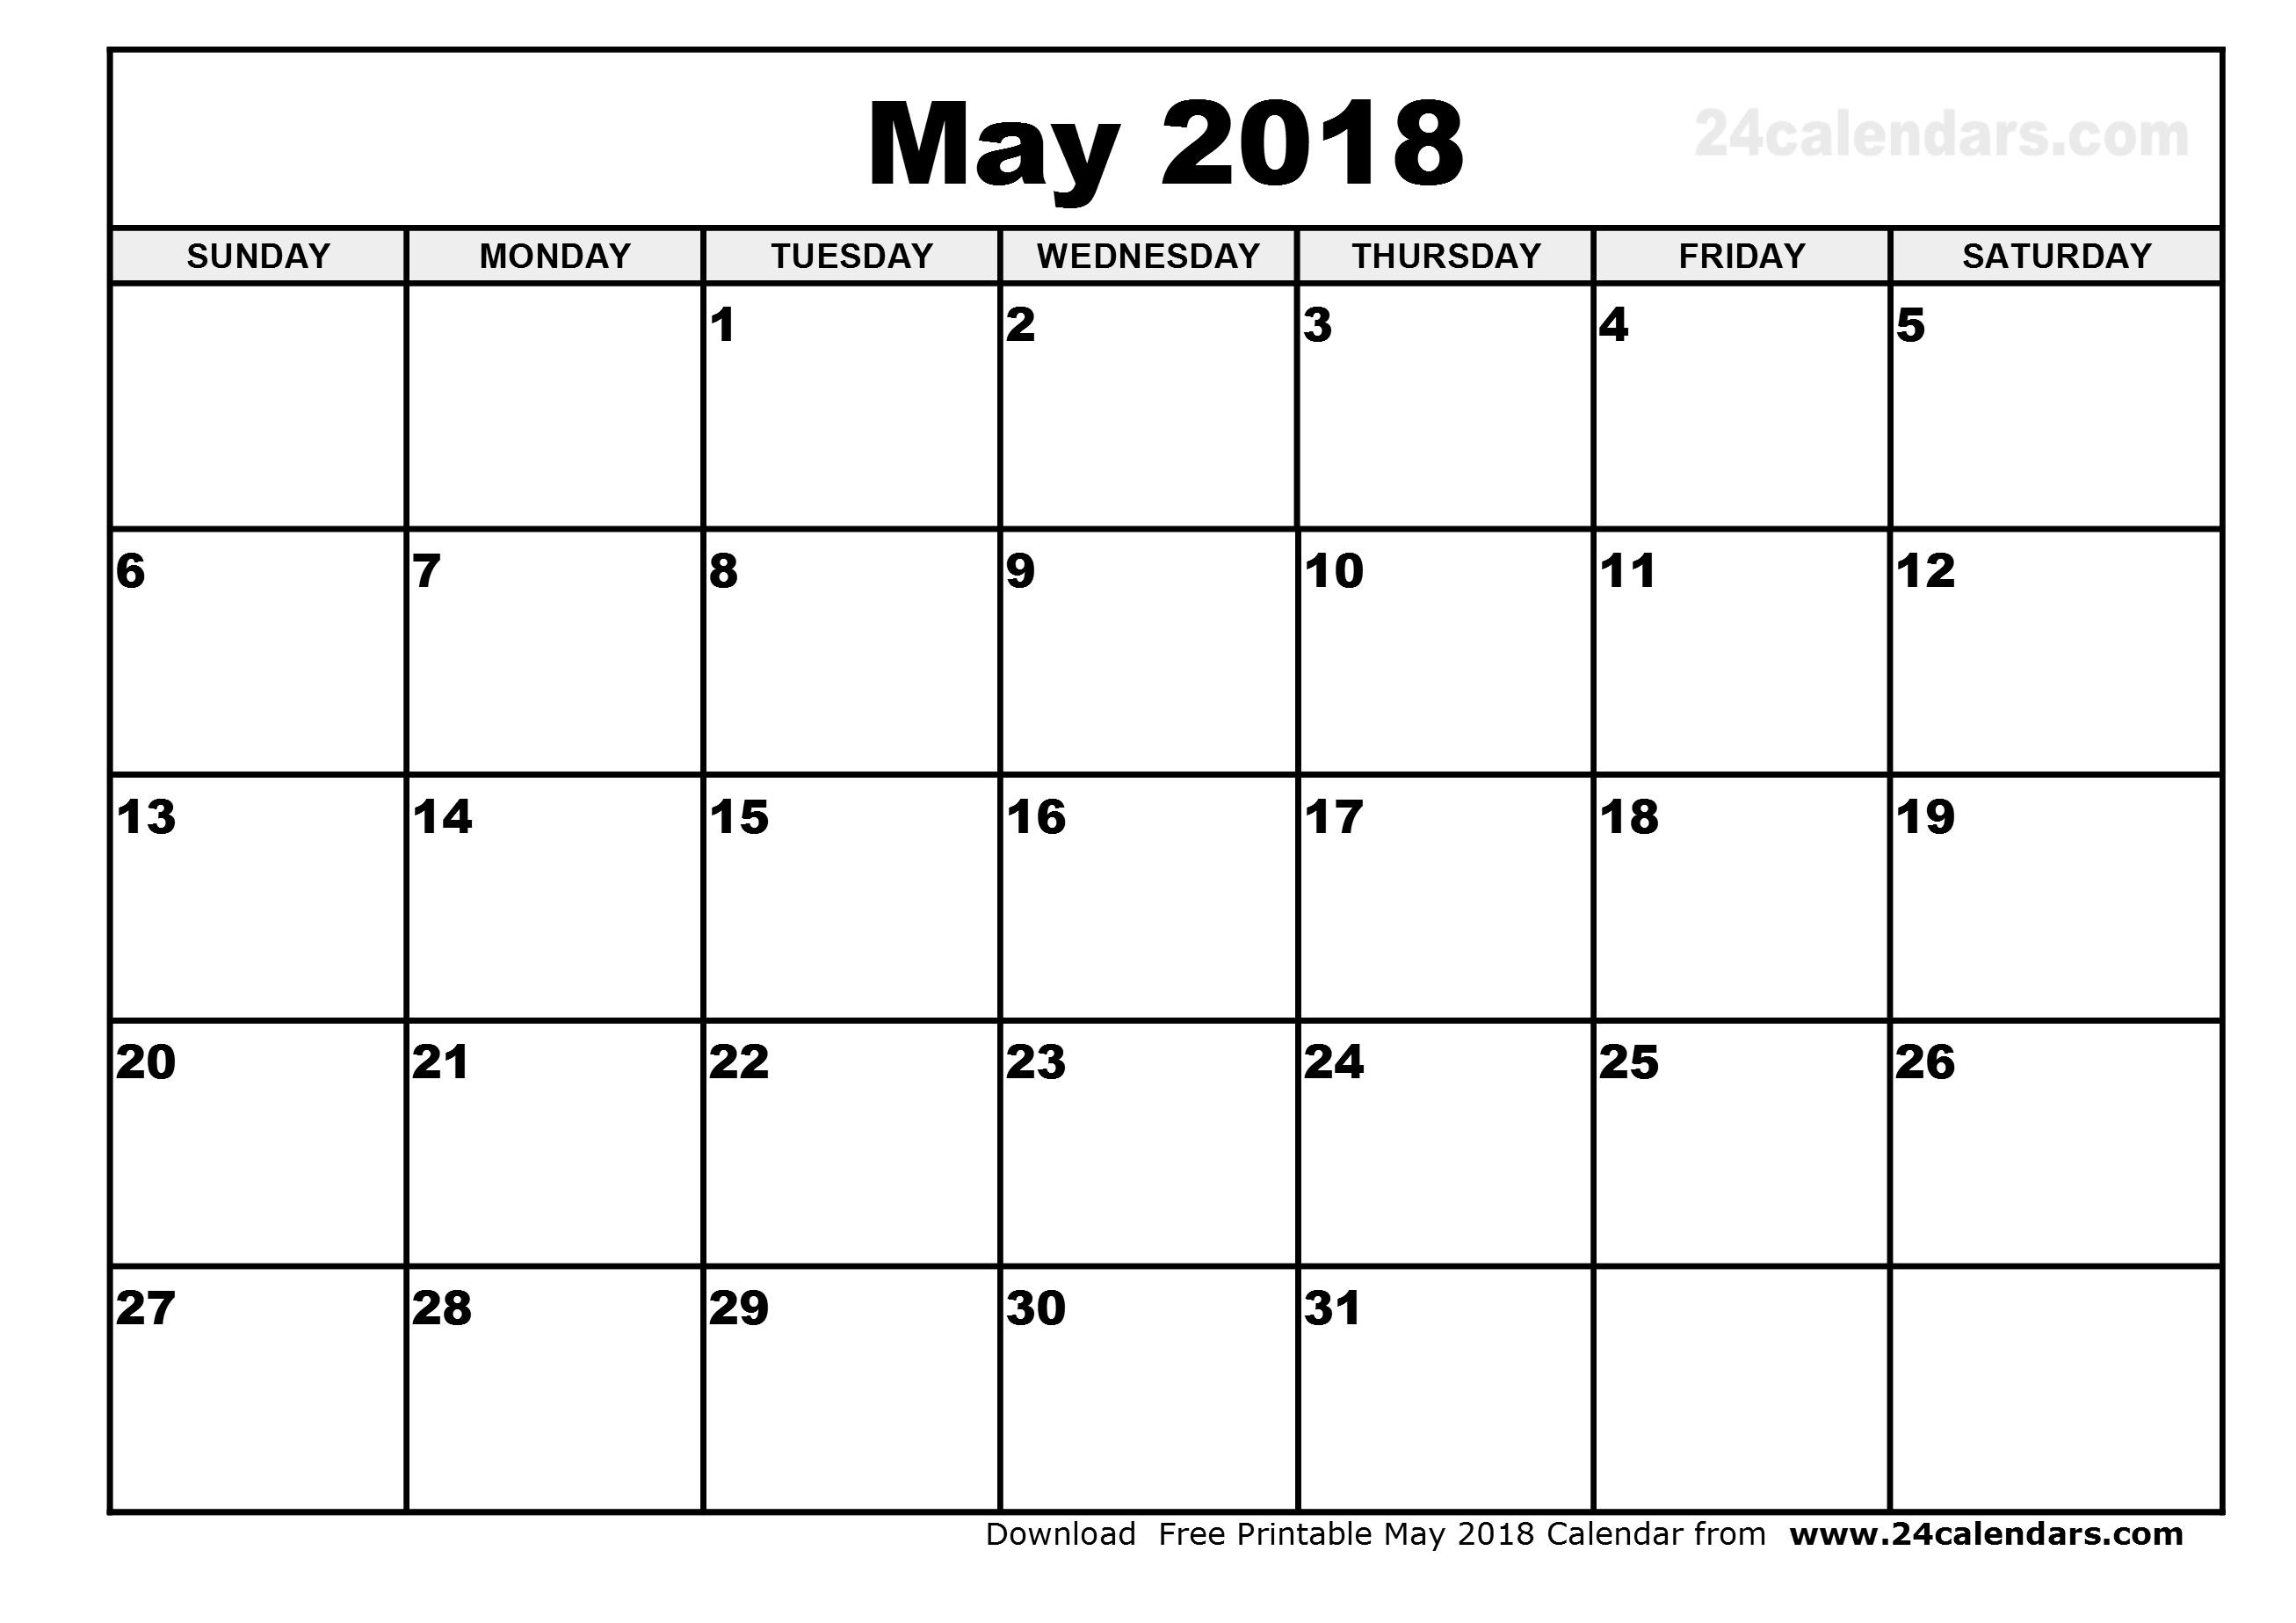 Printable Calendar May 2018 PDF